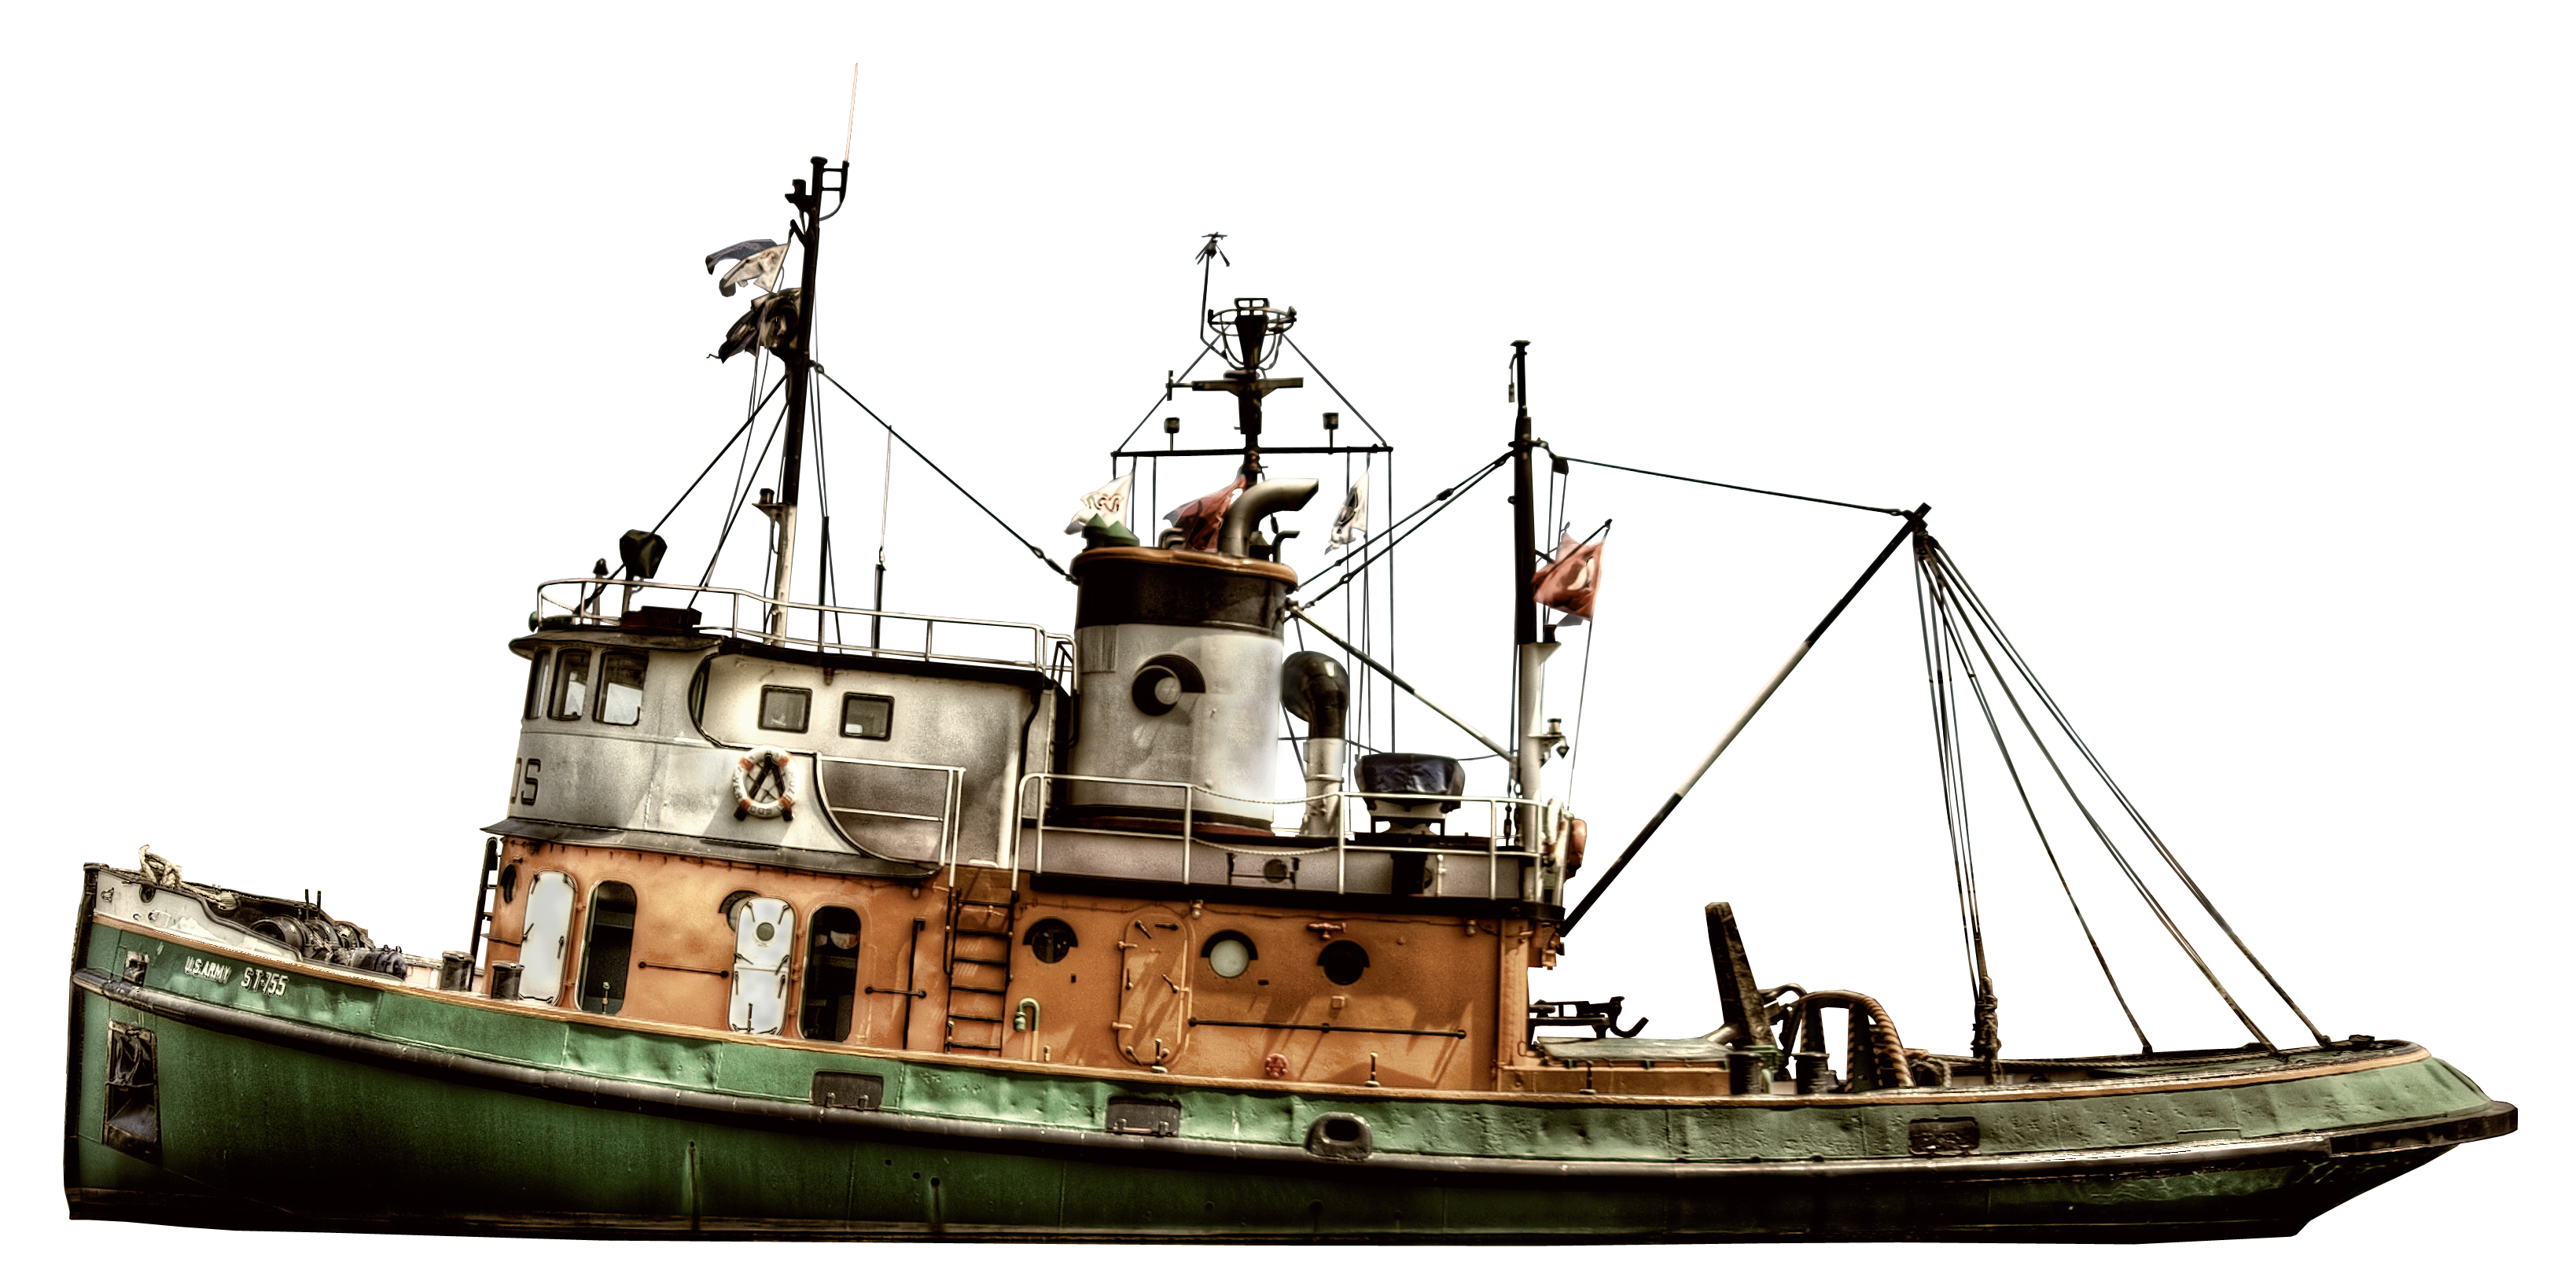 Wooden Boat Png Image Wooden Boats Png Sailboat Design